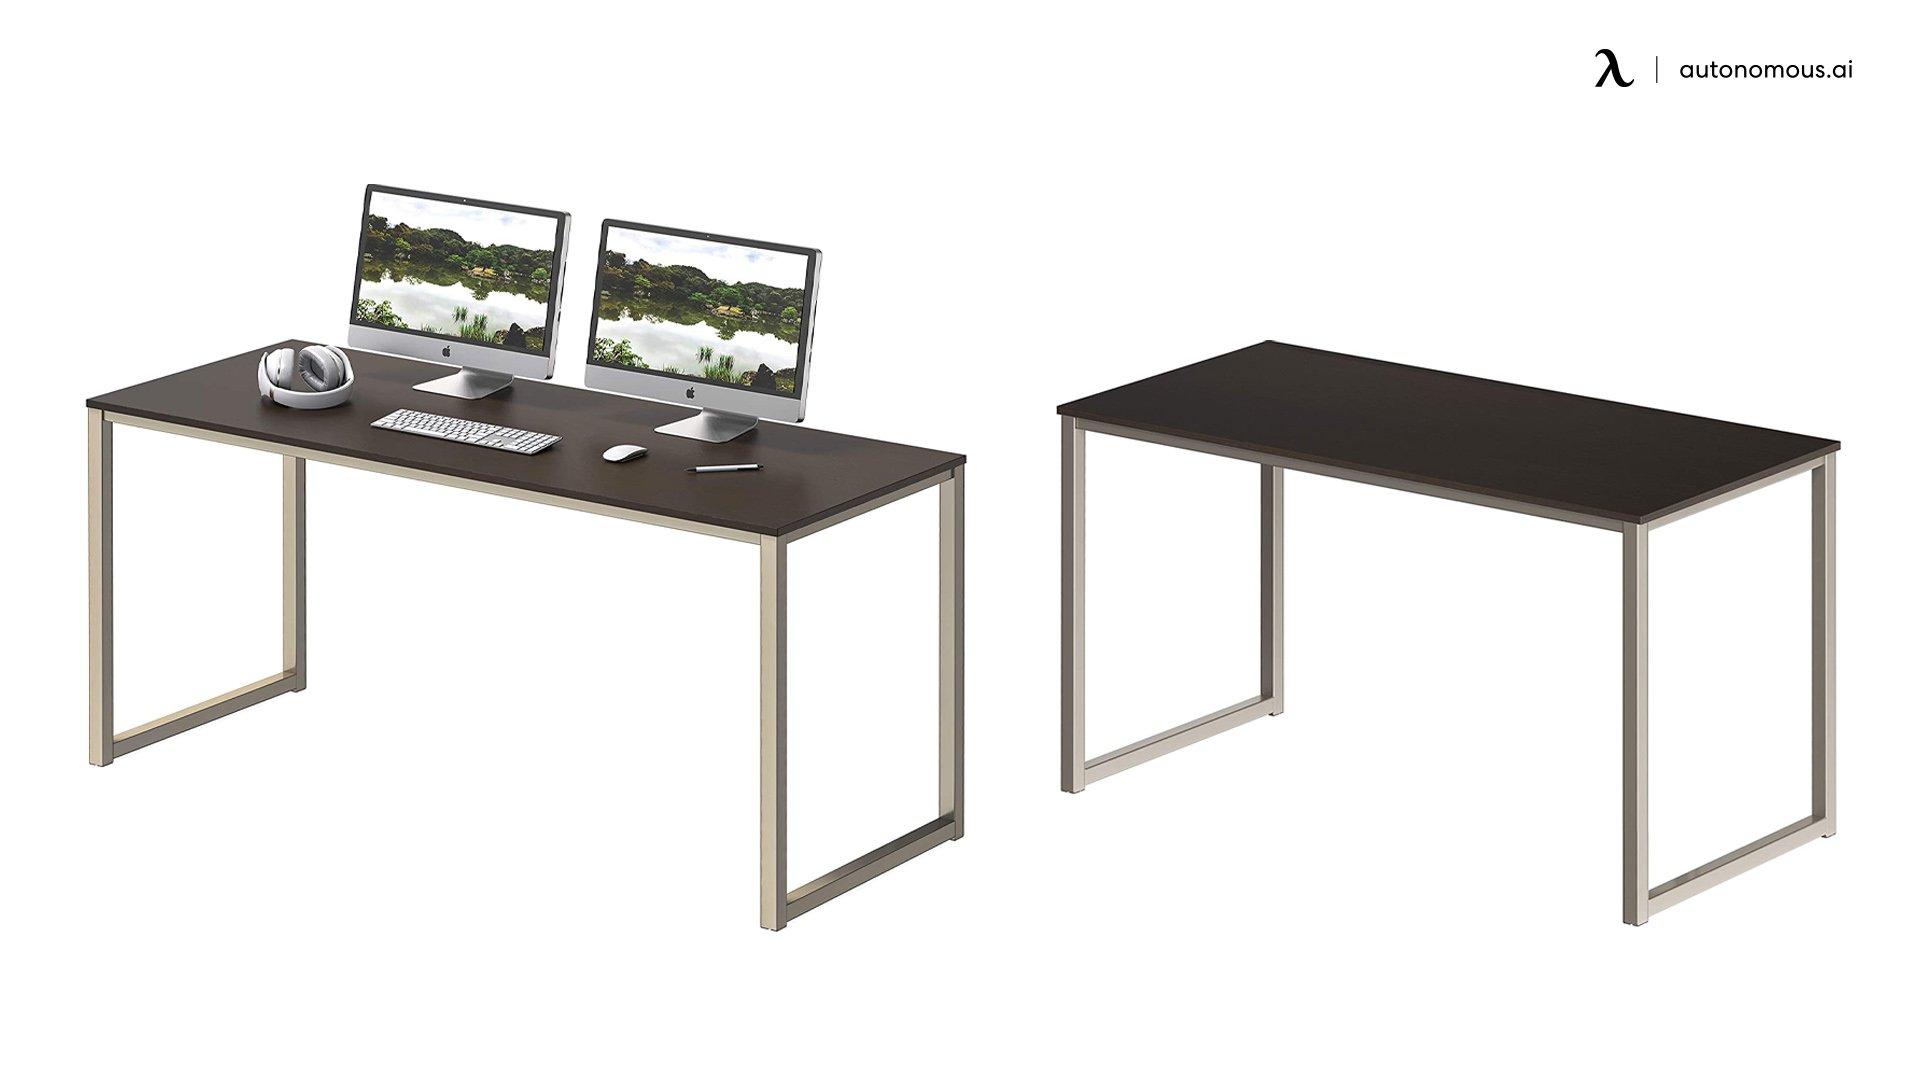 SHW Home Office Computer Desk